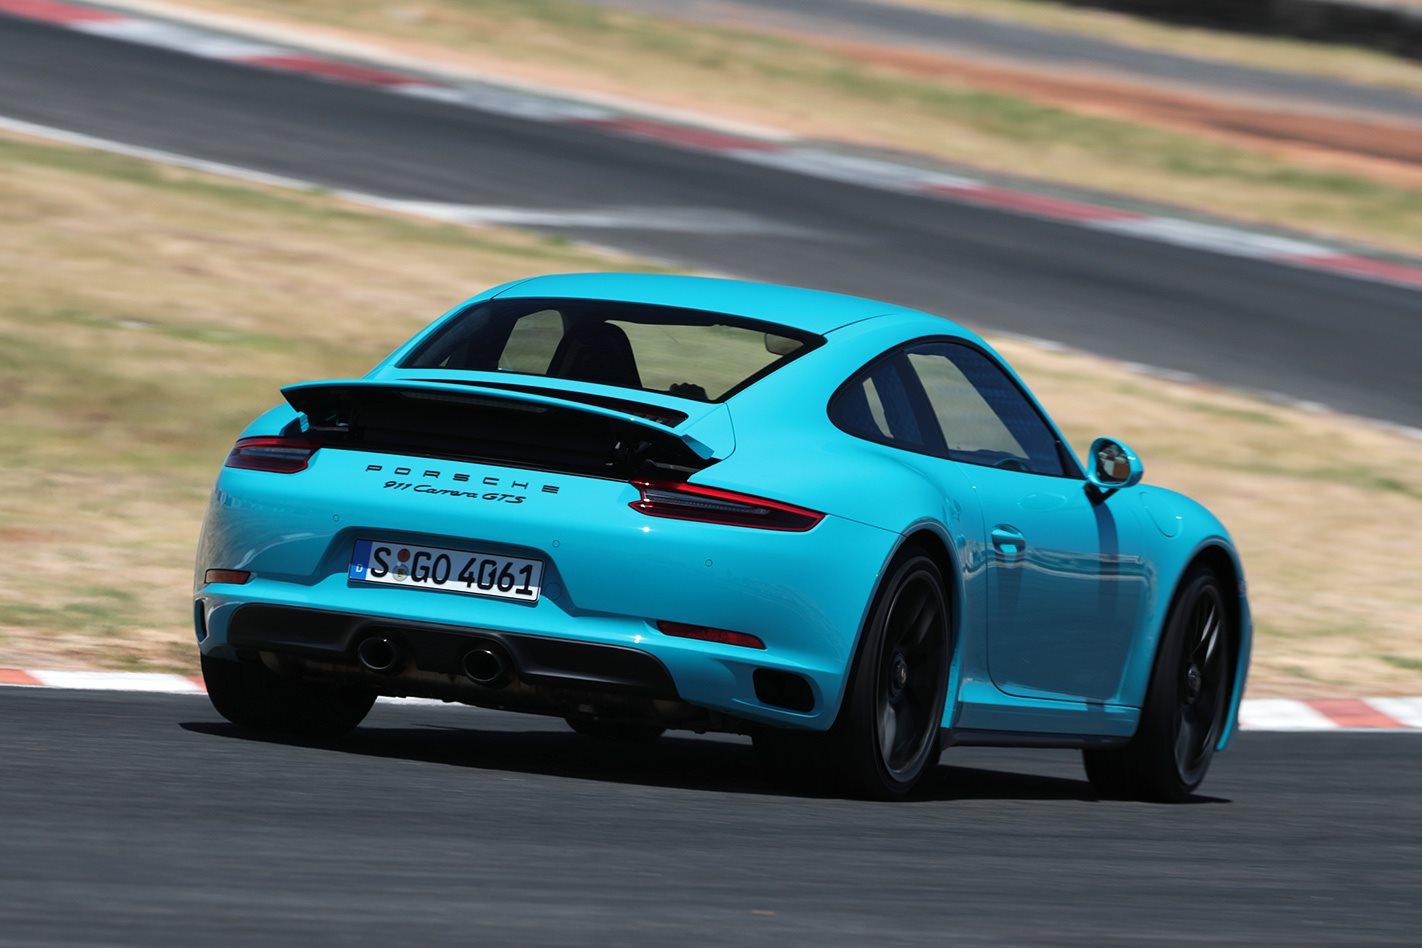 2017 Porsche 911 GTS rear